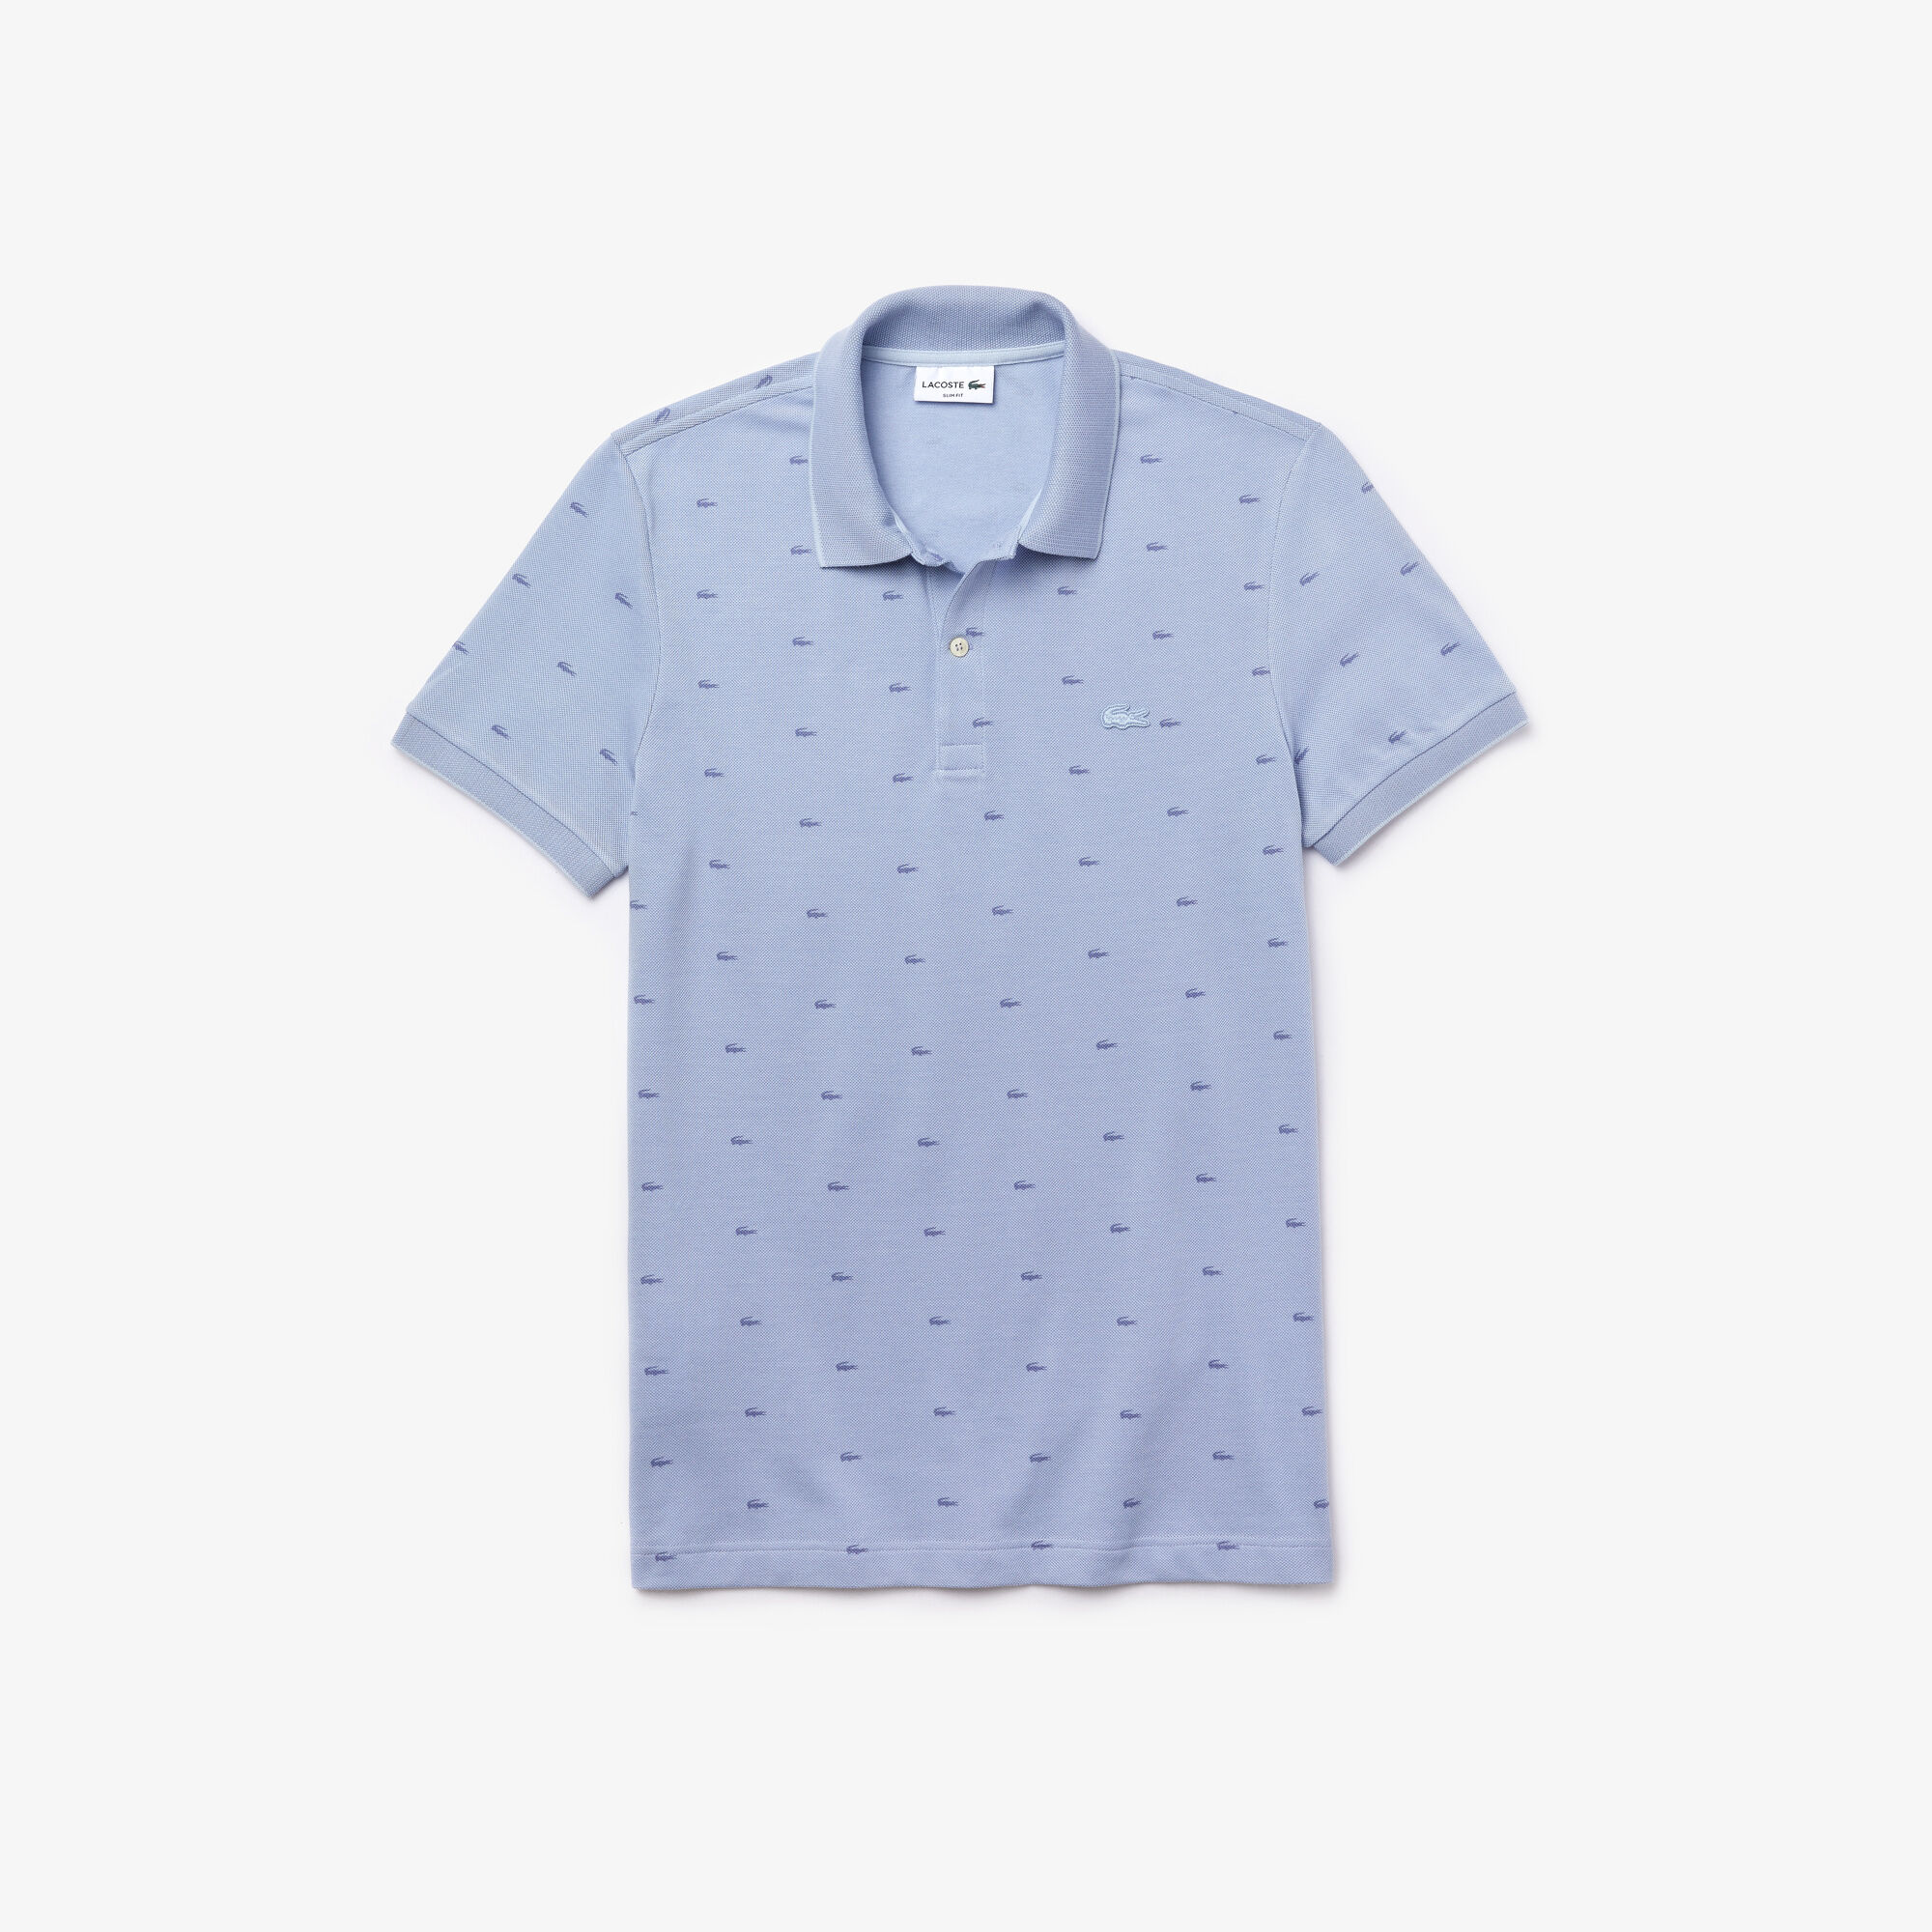 Men's Lacoste Micro Print Polo Shirt